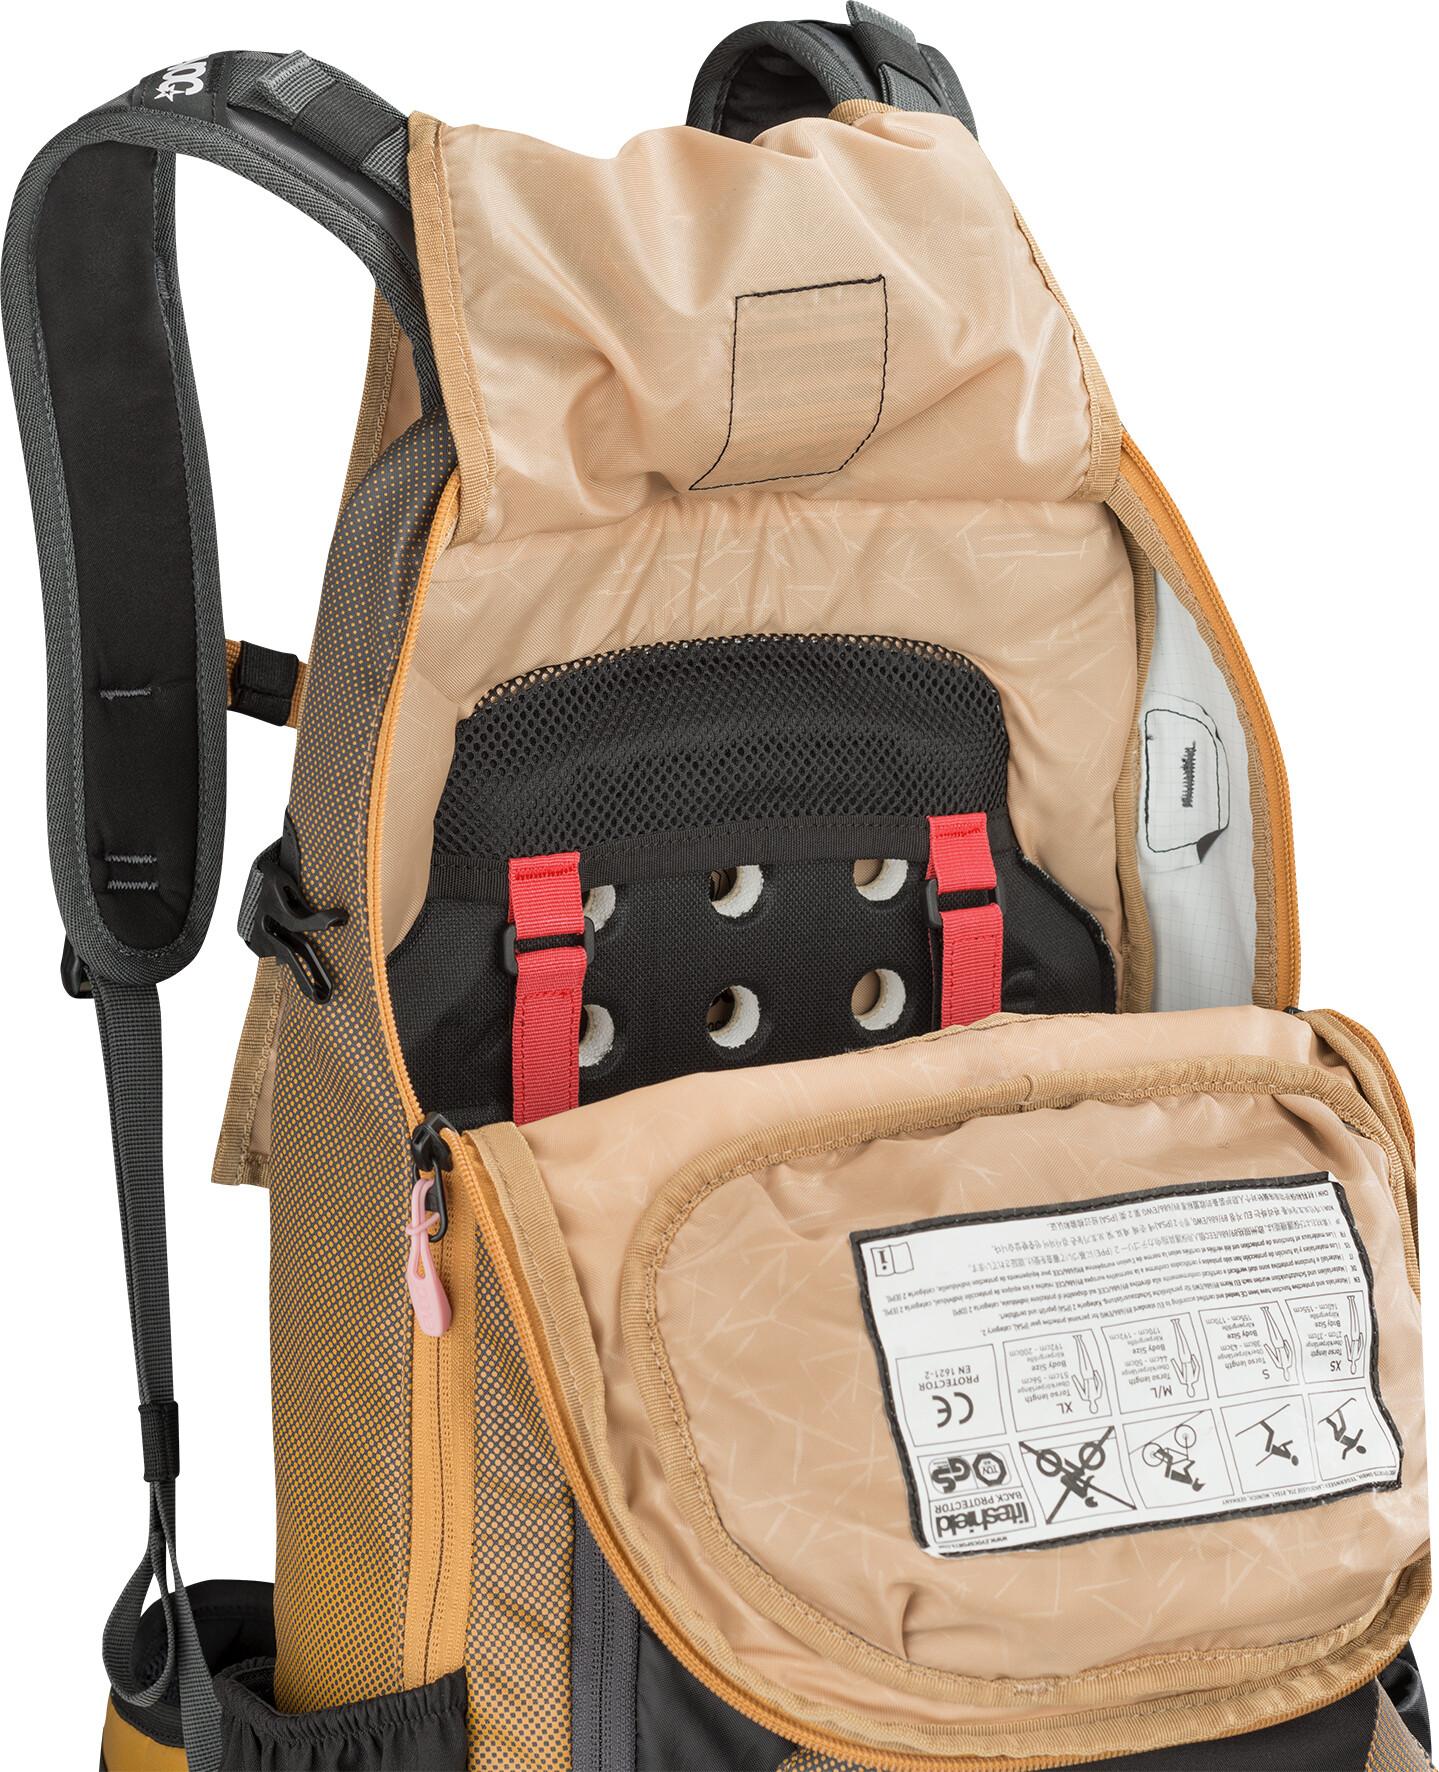 770a17aeed04e EVOC FR Enduro Backpack 16L grey/orange at Addnature.co.uk